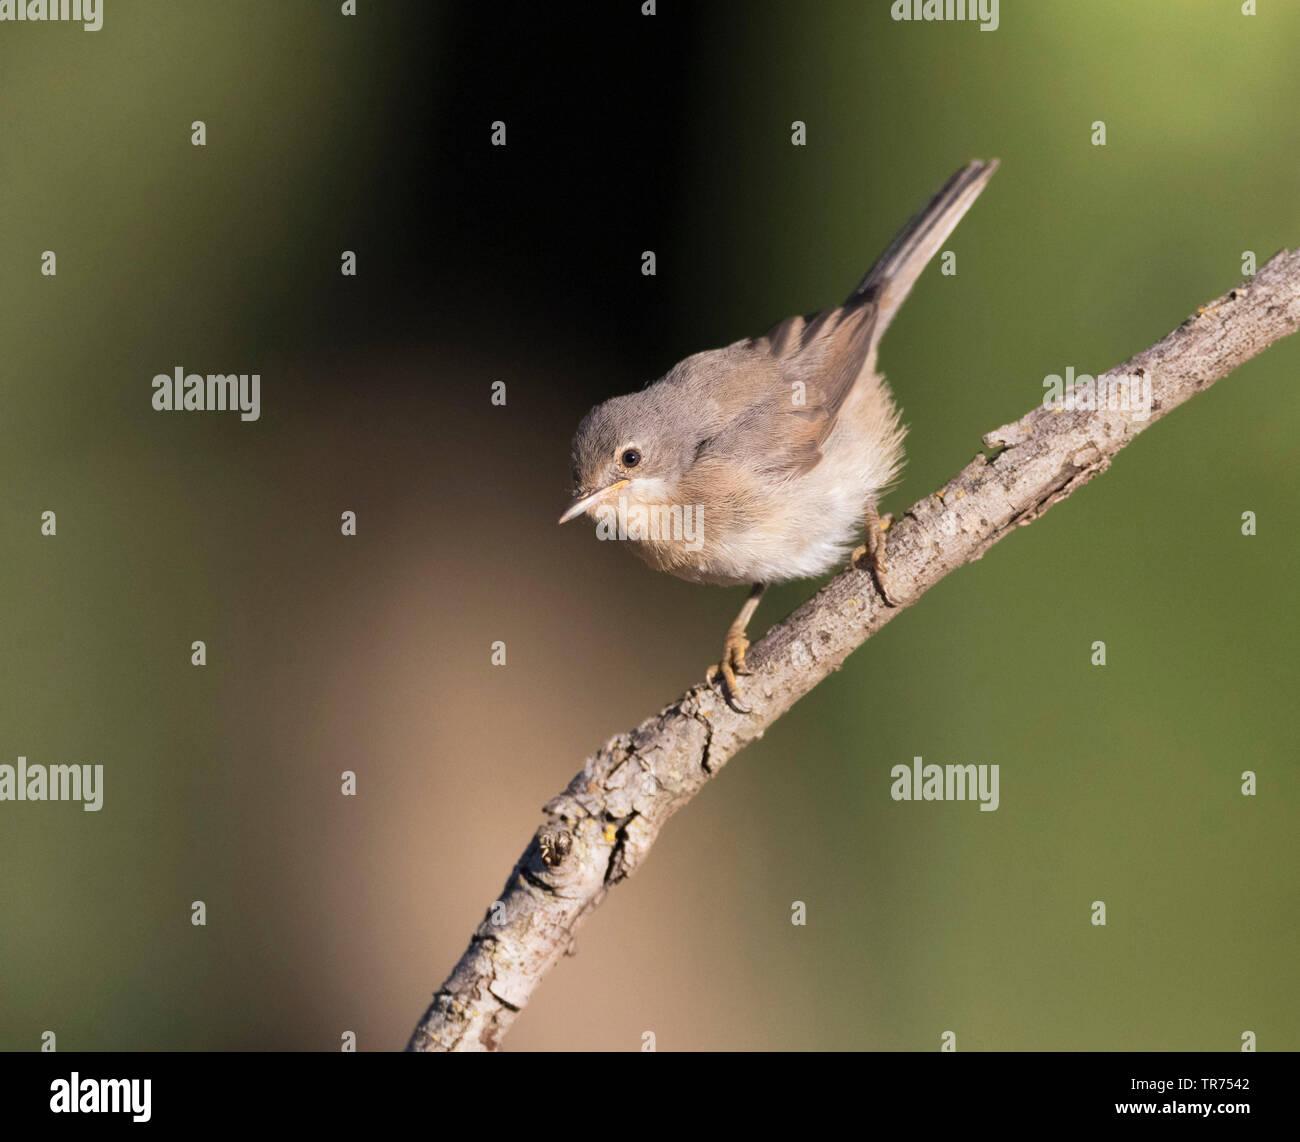 Westliche Bartgrasmuecke (Sylvia inornata), Spanien, Katalonien | Western Subalpine Warbler (Sylvia inornata), Spain, Katalonia, Solsona | BLWS498009. - Stock Image